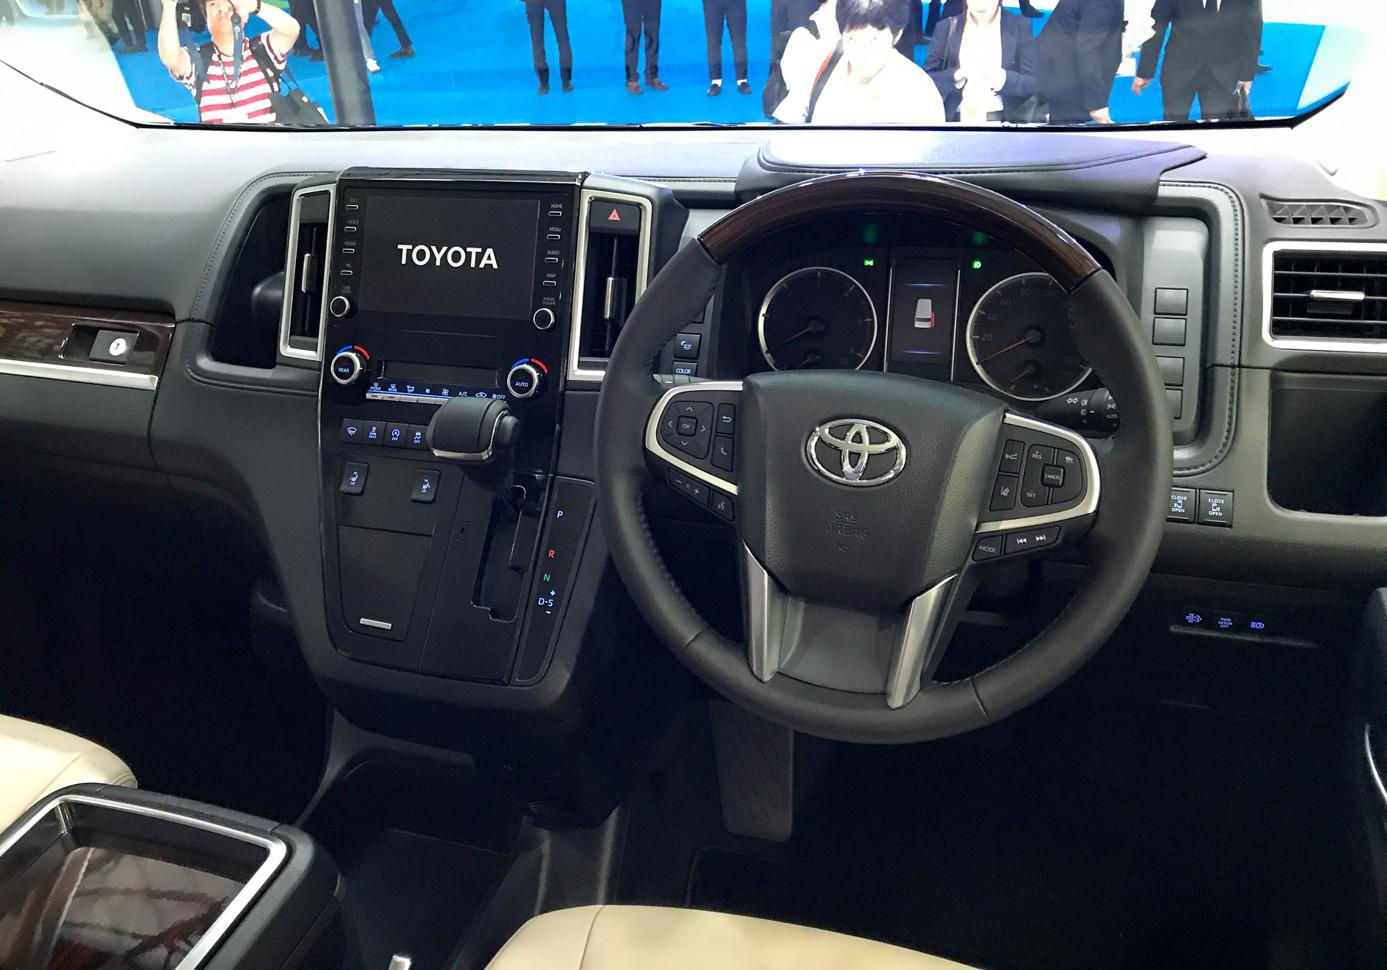 Автосалон в Токио: представлена по-настоящему богатая Toyota 2